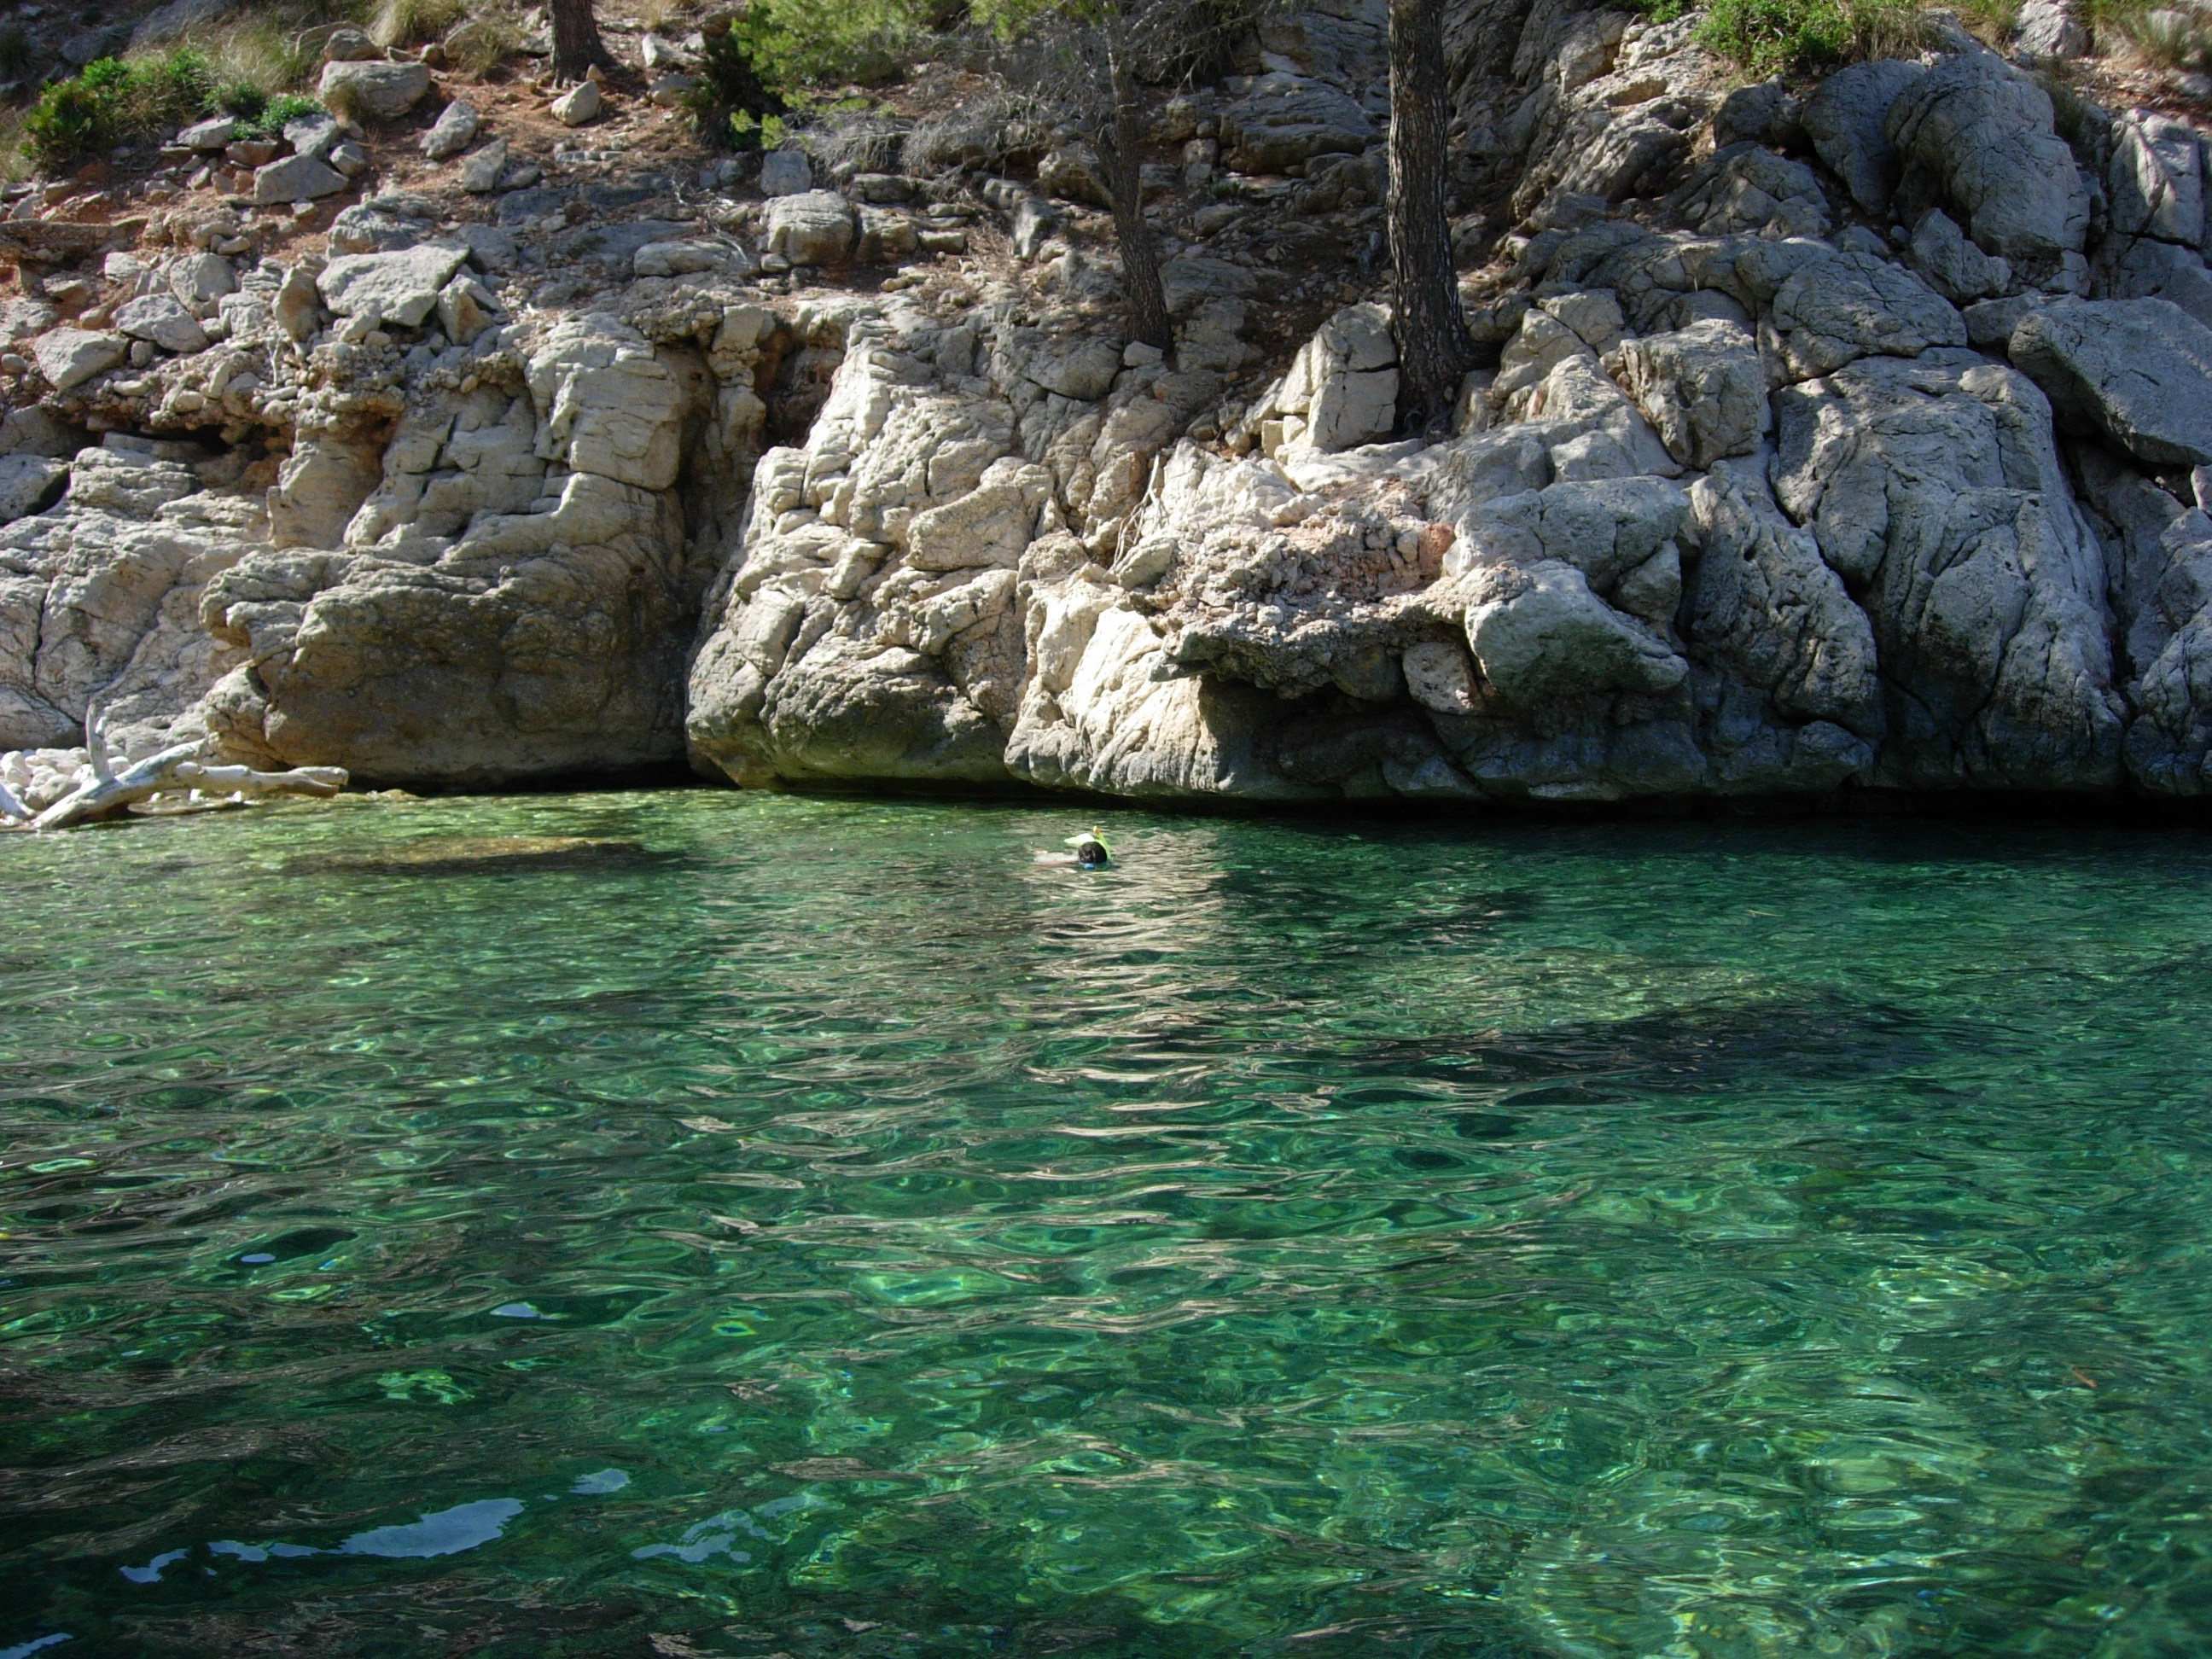 Foto playa Cala en gossalba. Cala engossauba